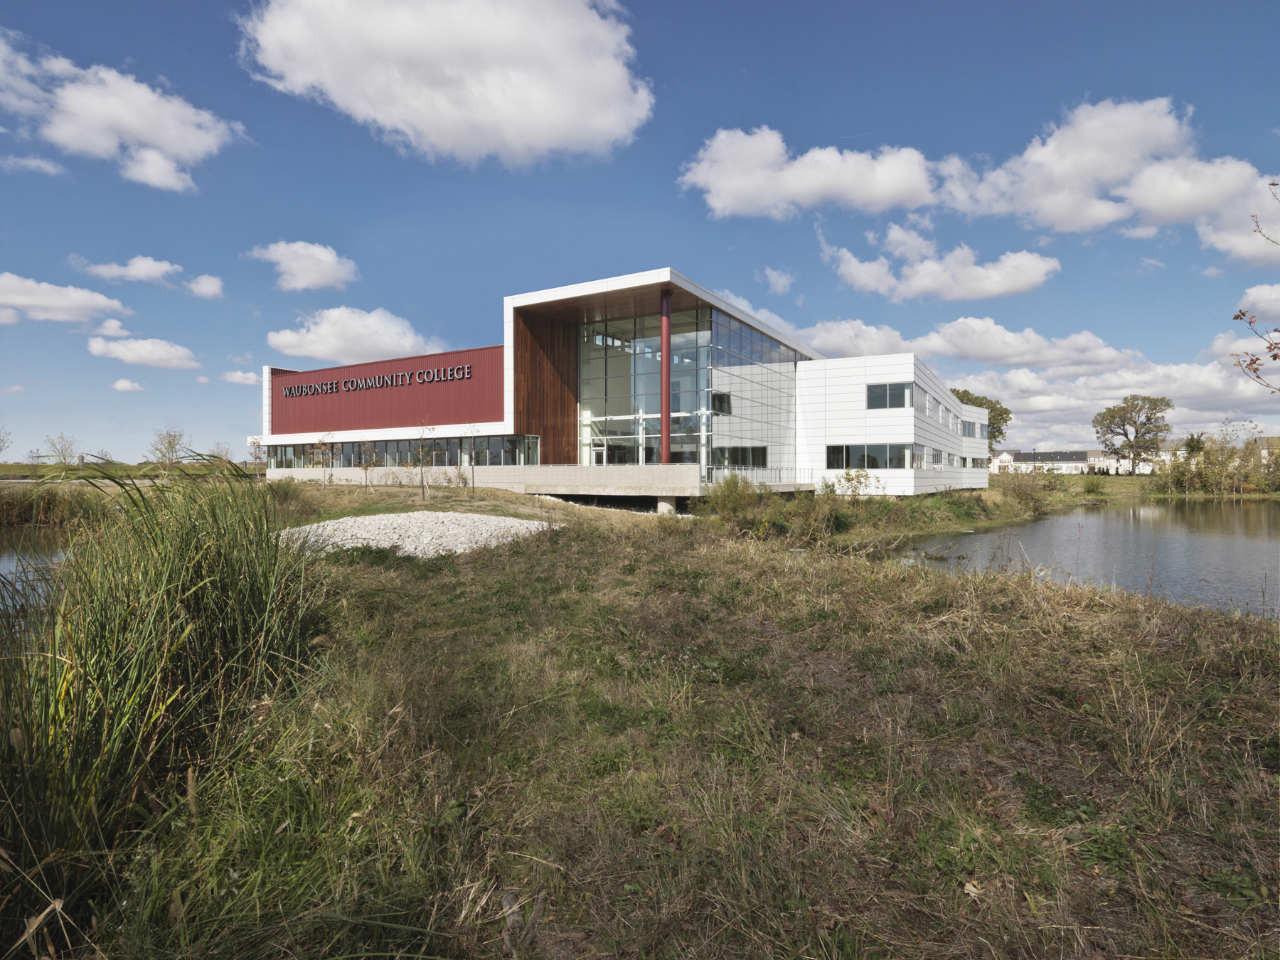 Waubonsee Community College Plano Classroom Building / Holabird & Root, © Jim Steinkamp Photography